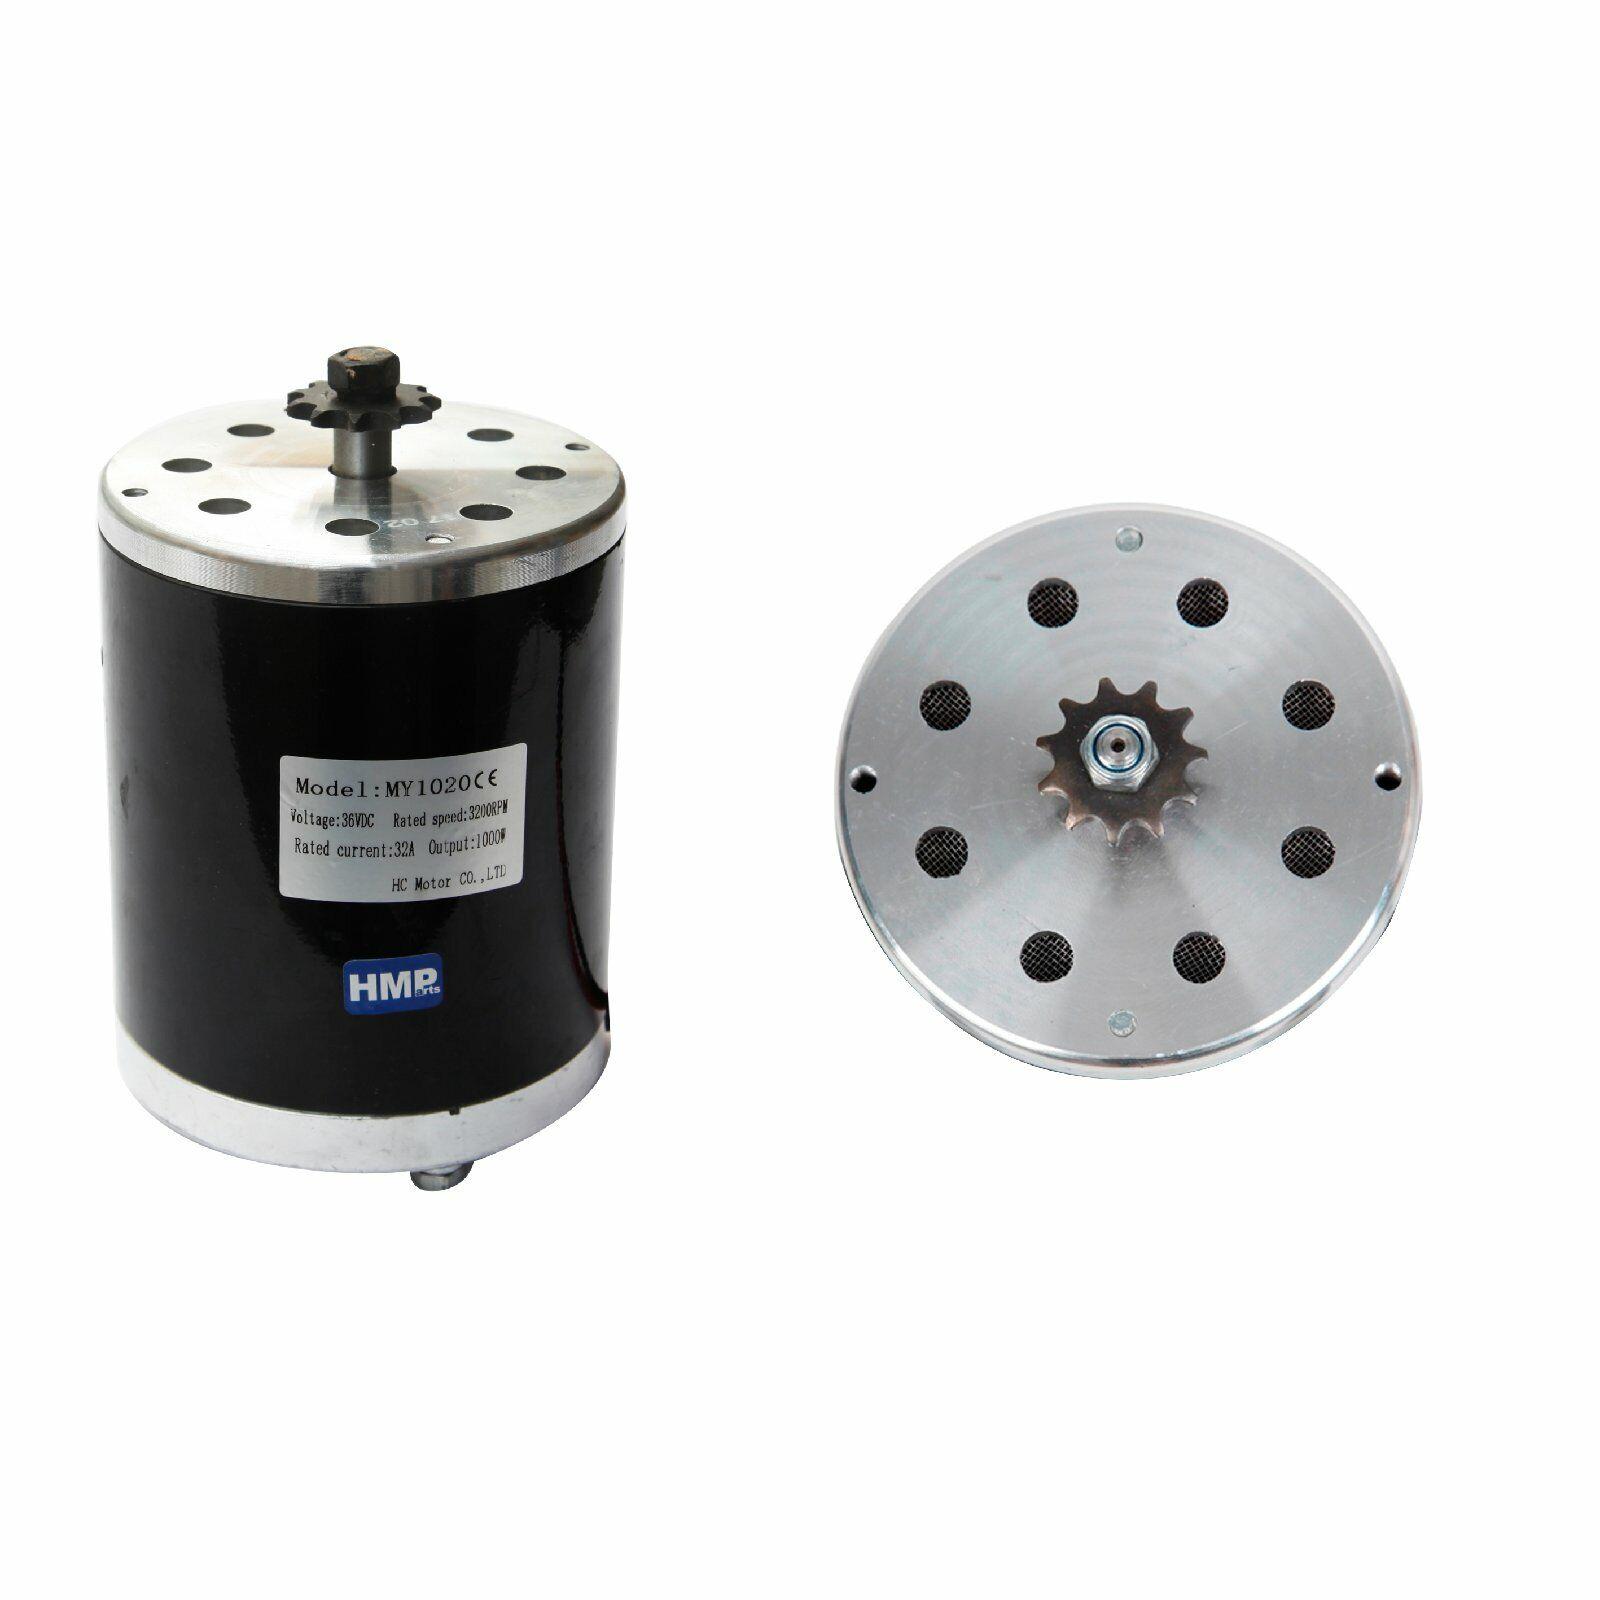 Hmparts Motore Elettrico EMotorino per P. Es. Mach 1 36V 1000 W My 1020 Dc